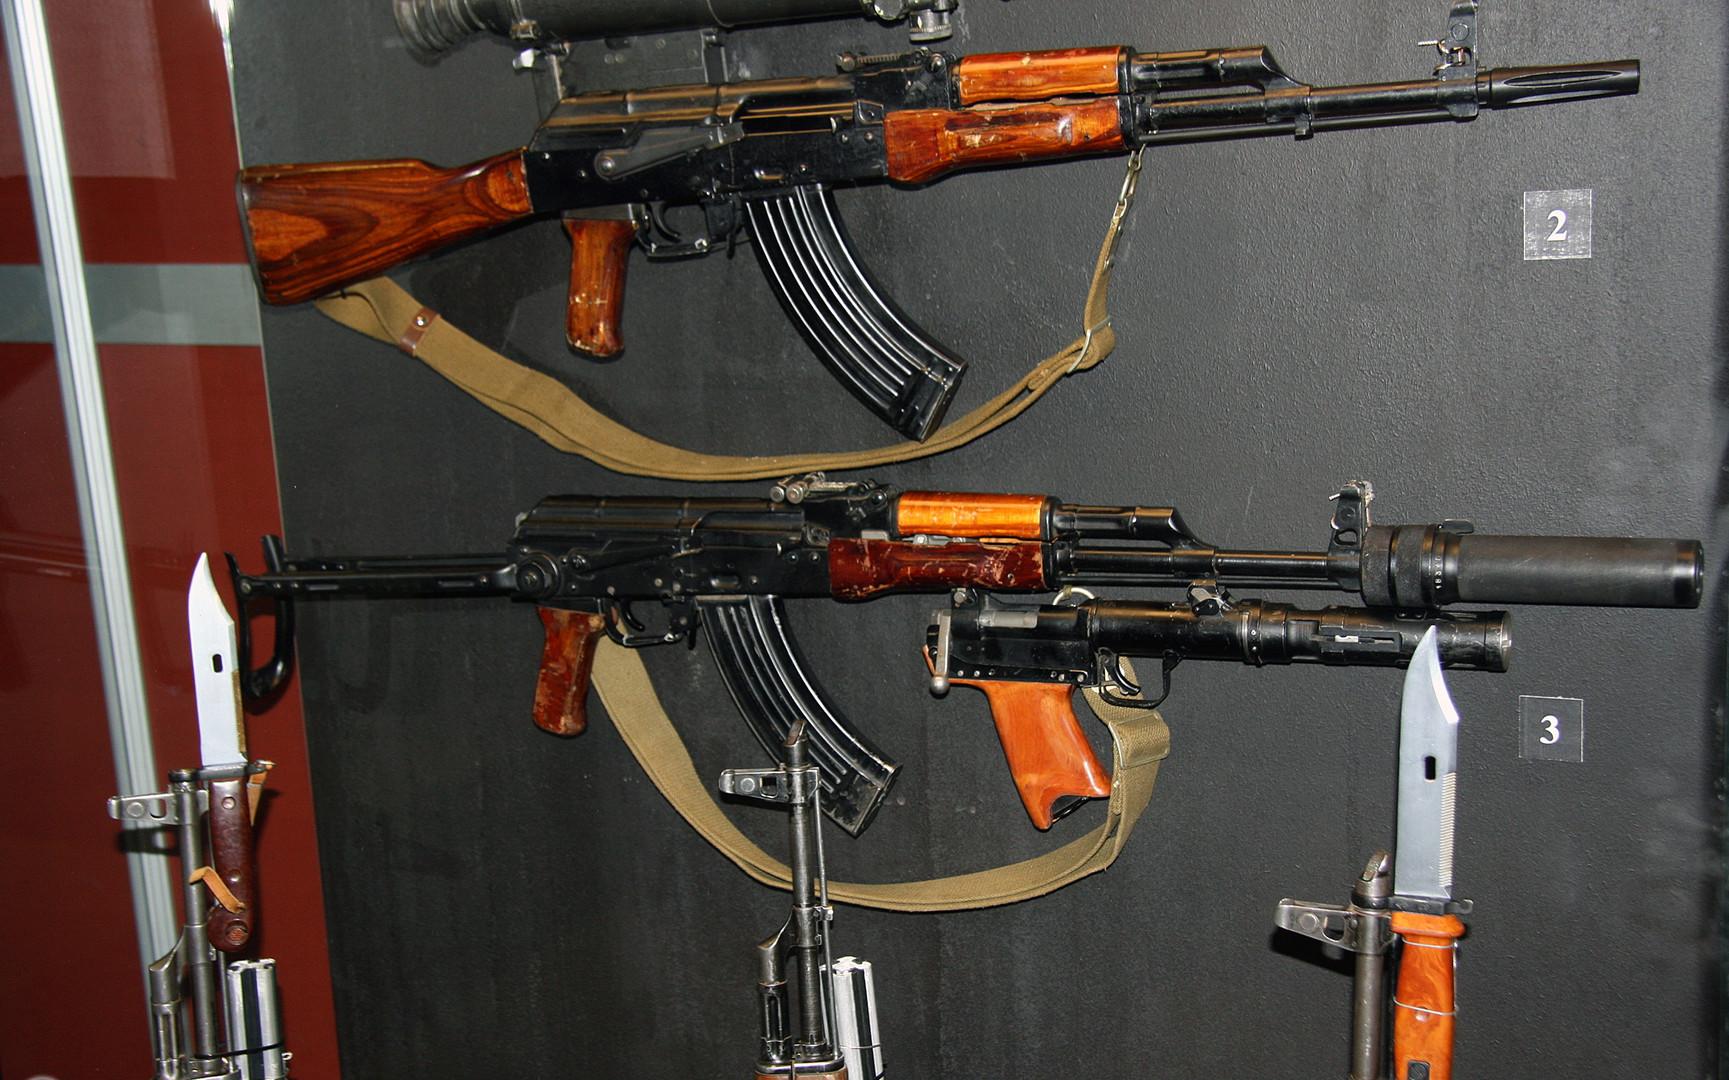 Tishina_automatic_grenade_launcher.jpg